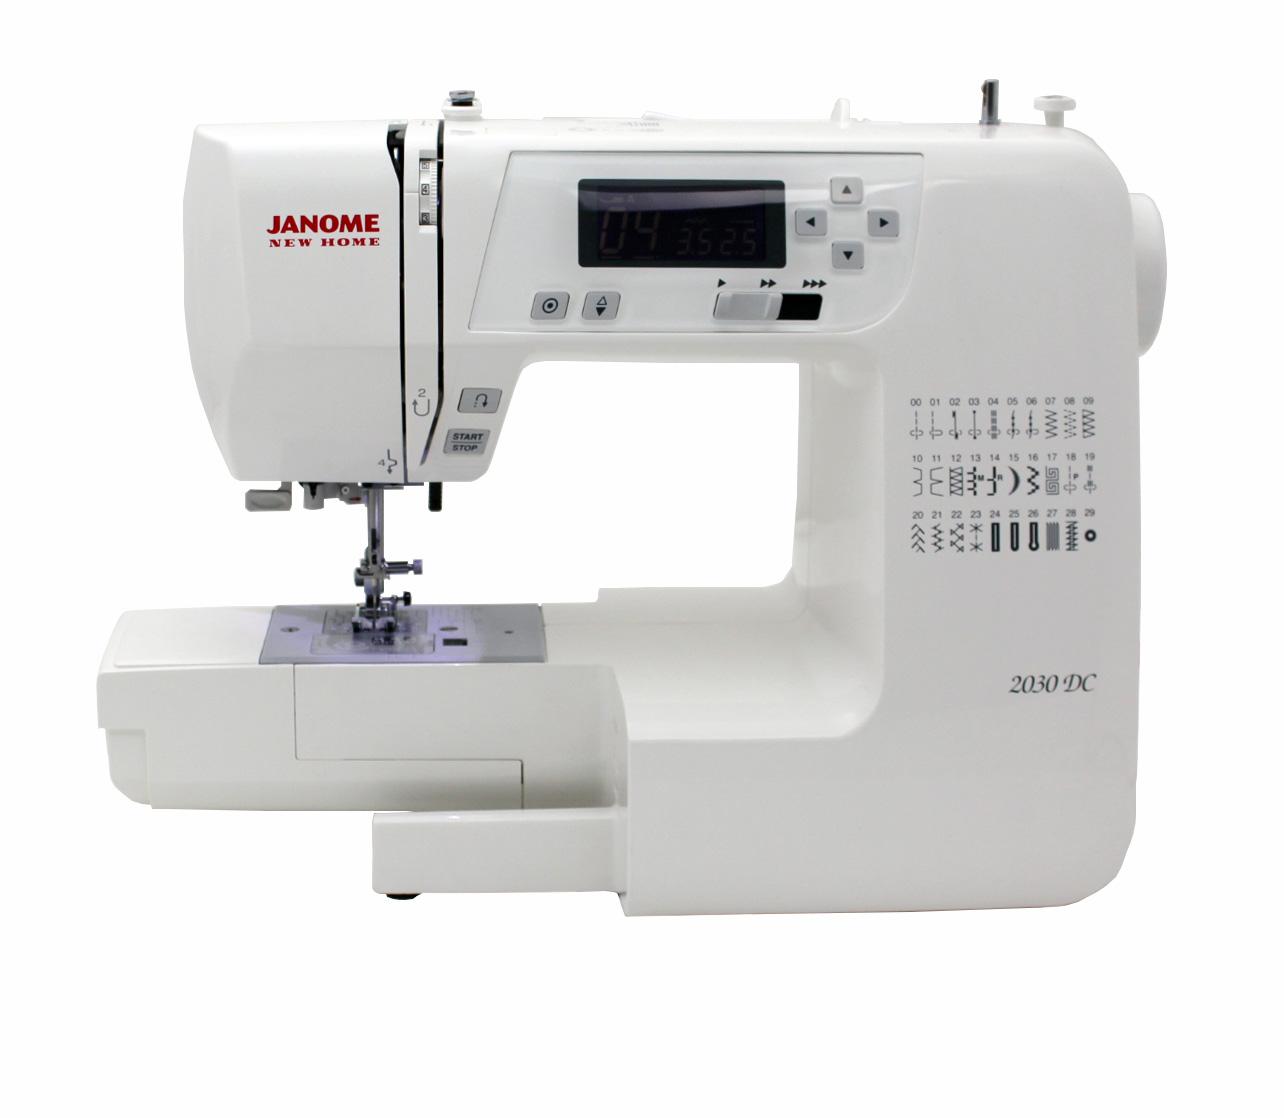 sewing machine refurbished